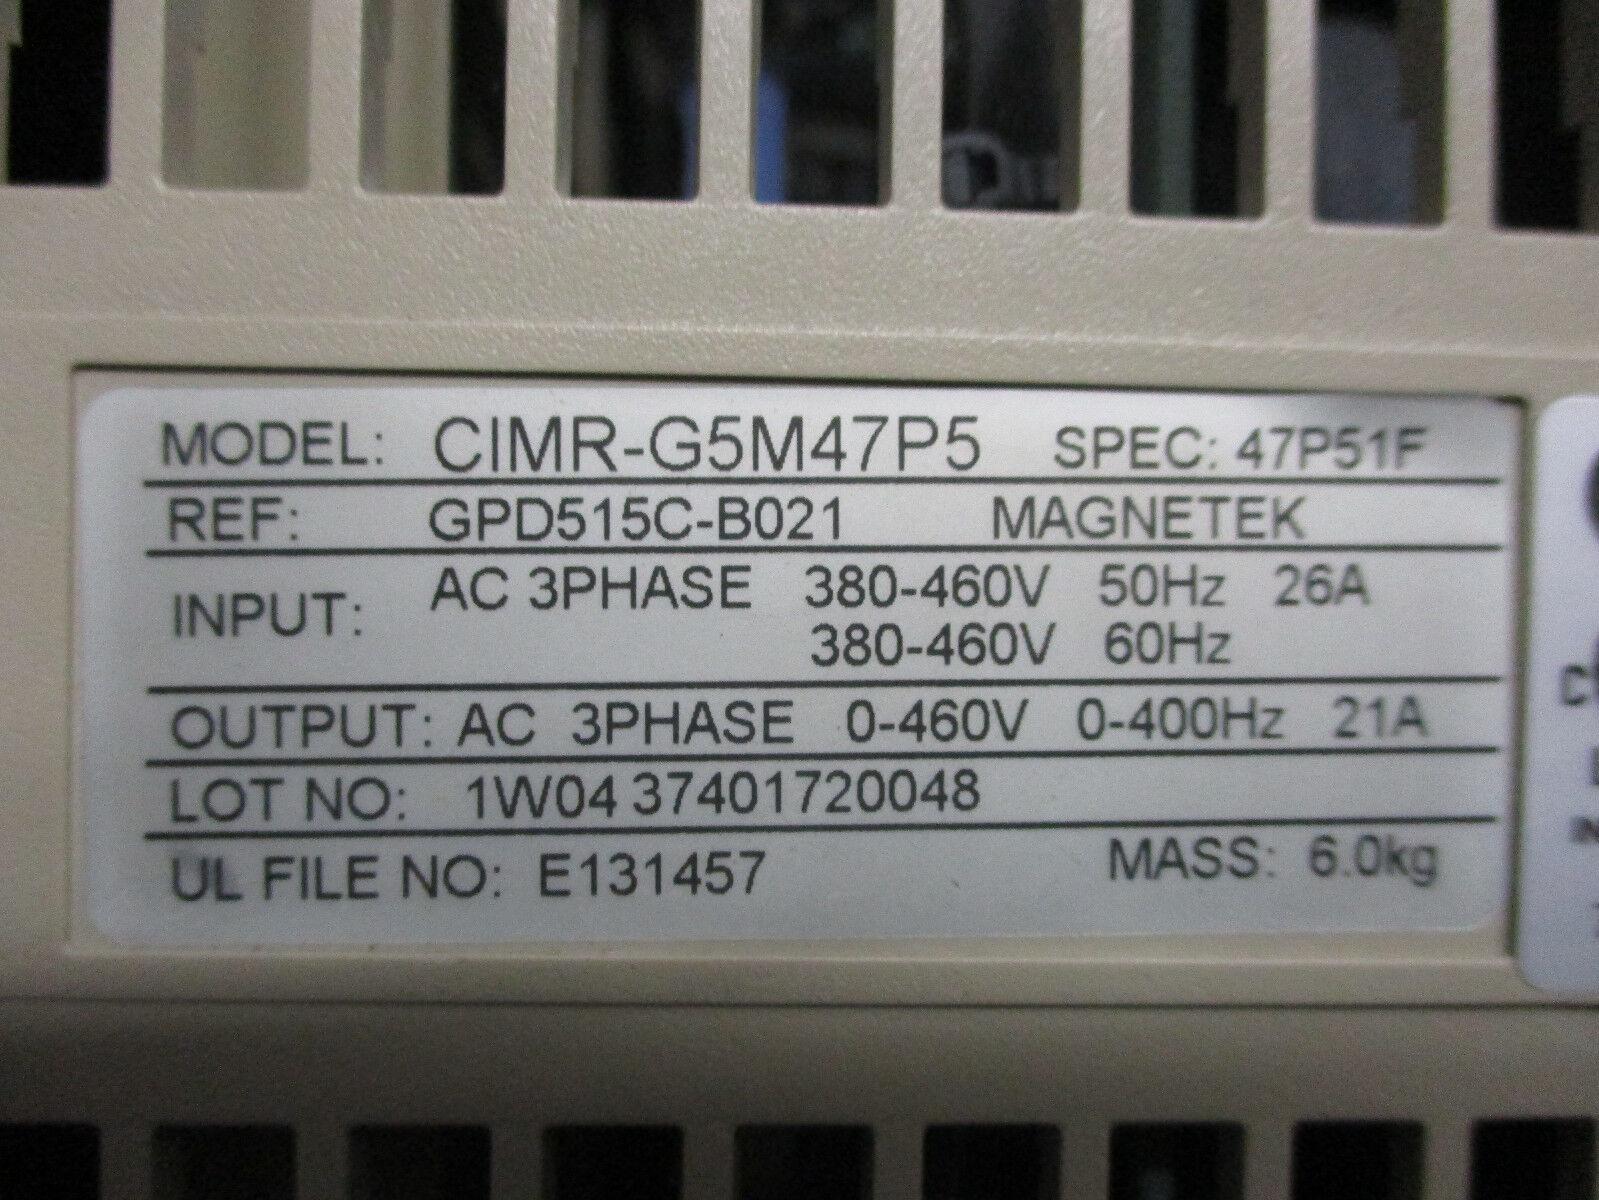 Yaskawa Cimr G5m47p5 Ac Drive 21 Amps 460 Volts Ebay Printed Circuit Board Repair On Allen Bradley Magnetek